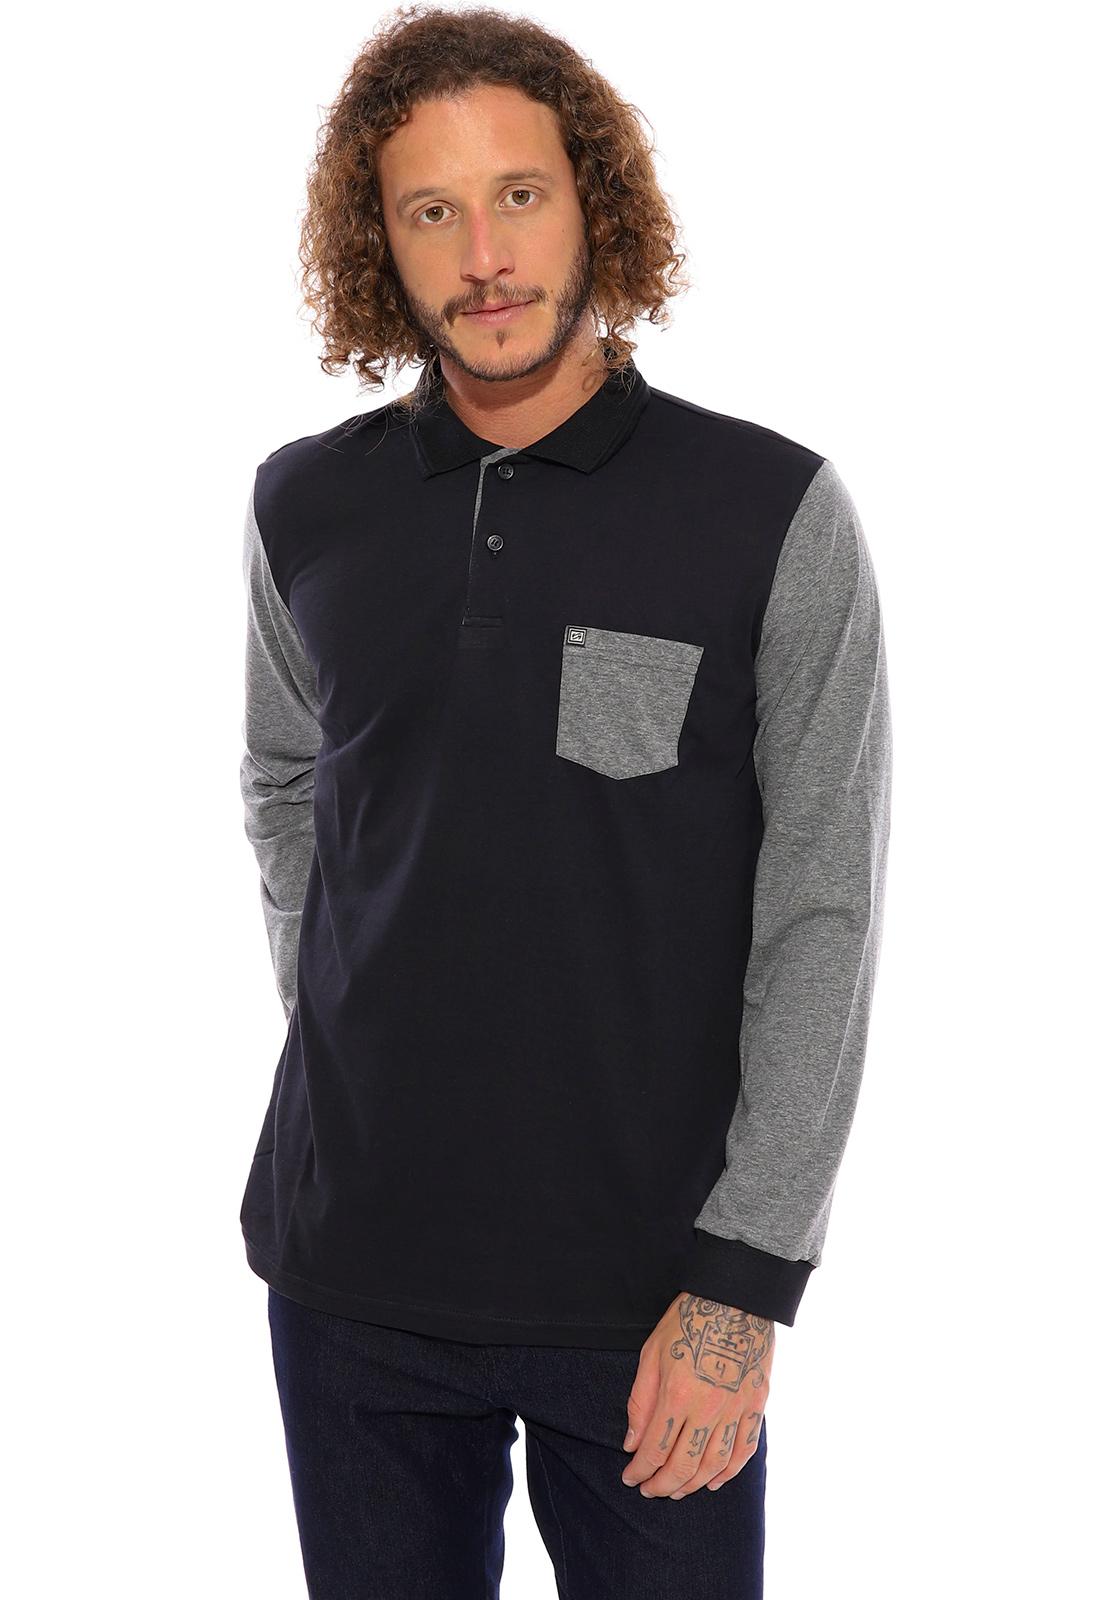 Camisa Polo Plus Size Vida Marinha Manga Longa Preto/Cinza